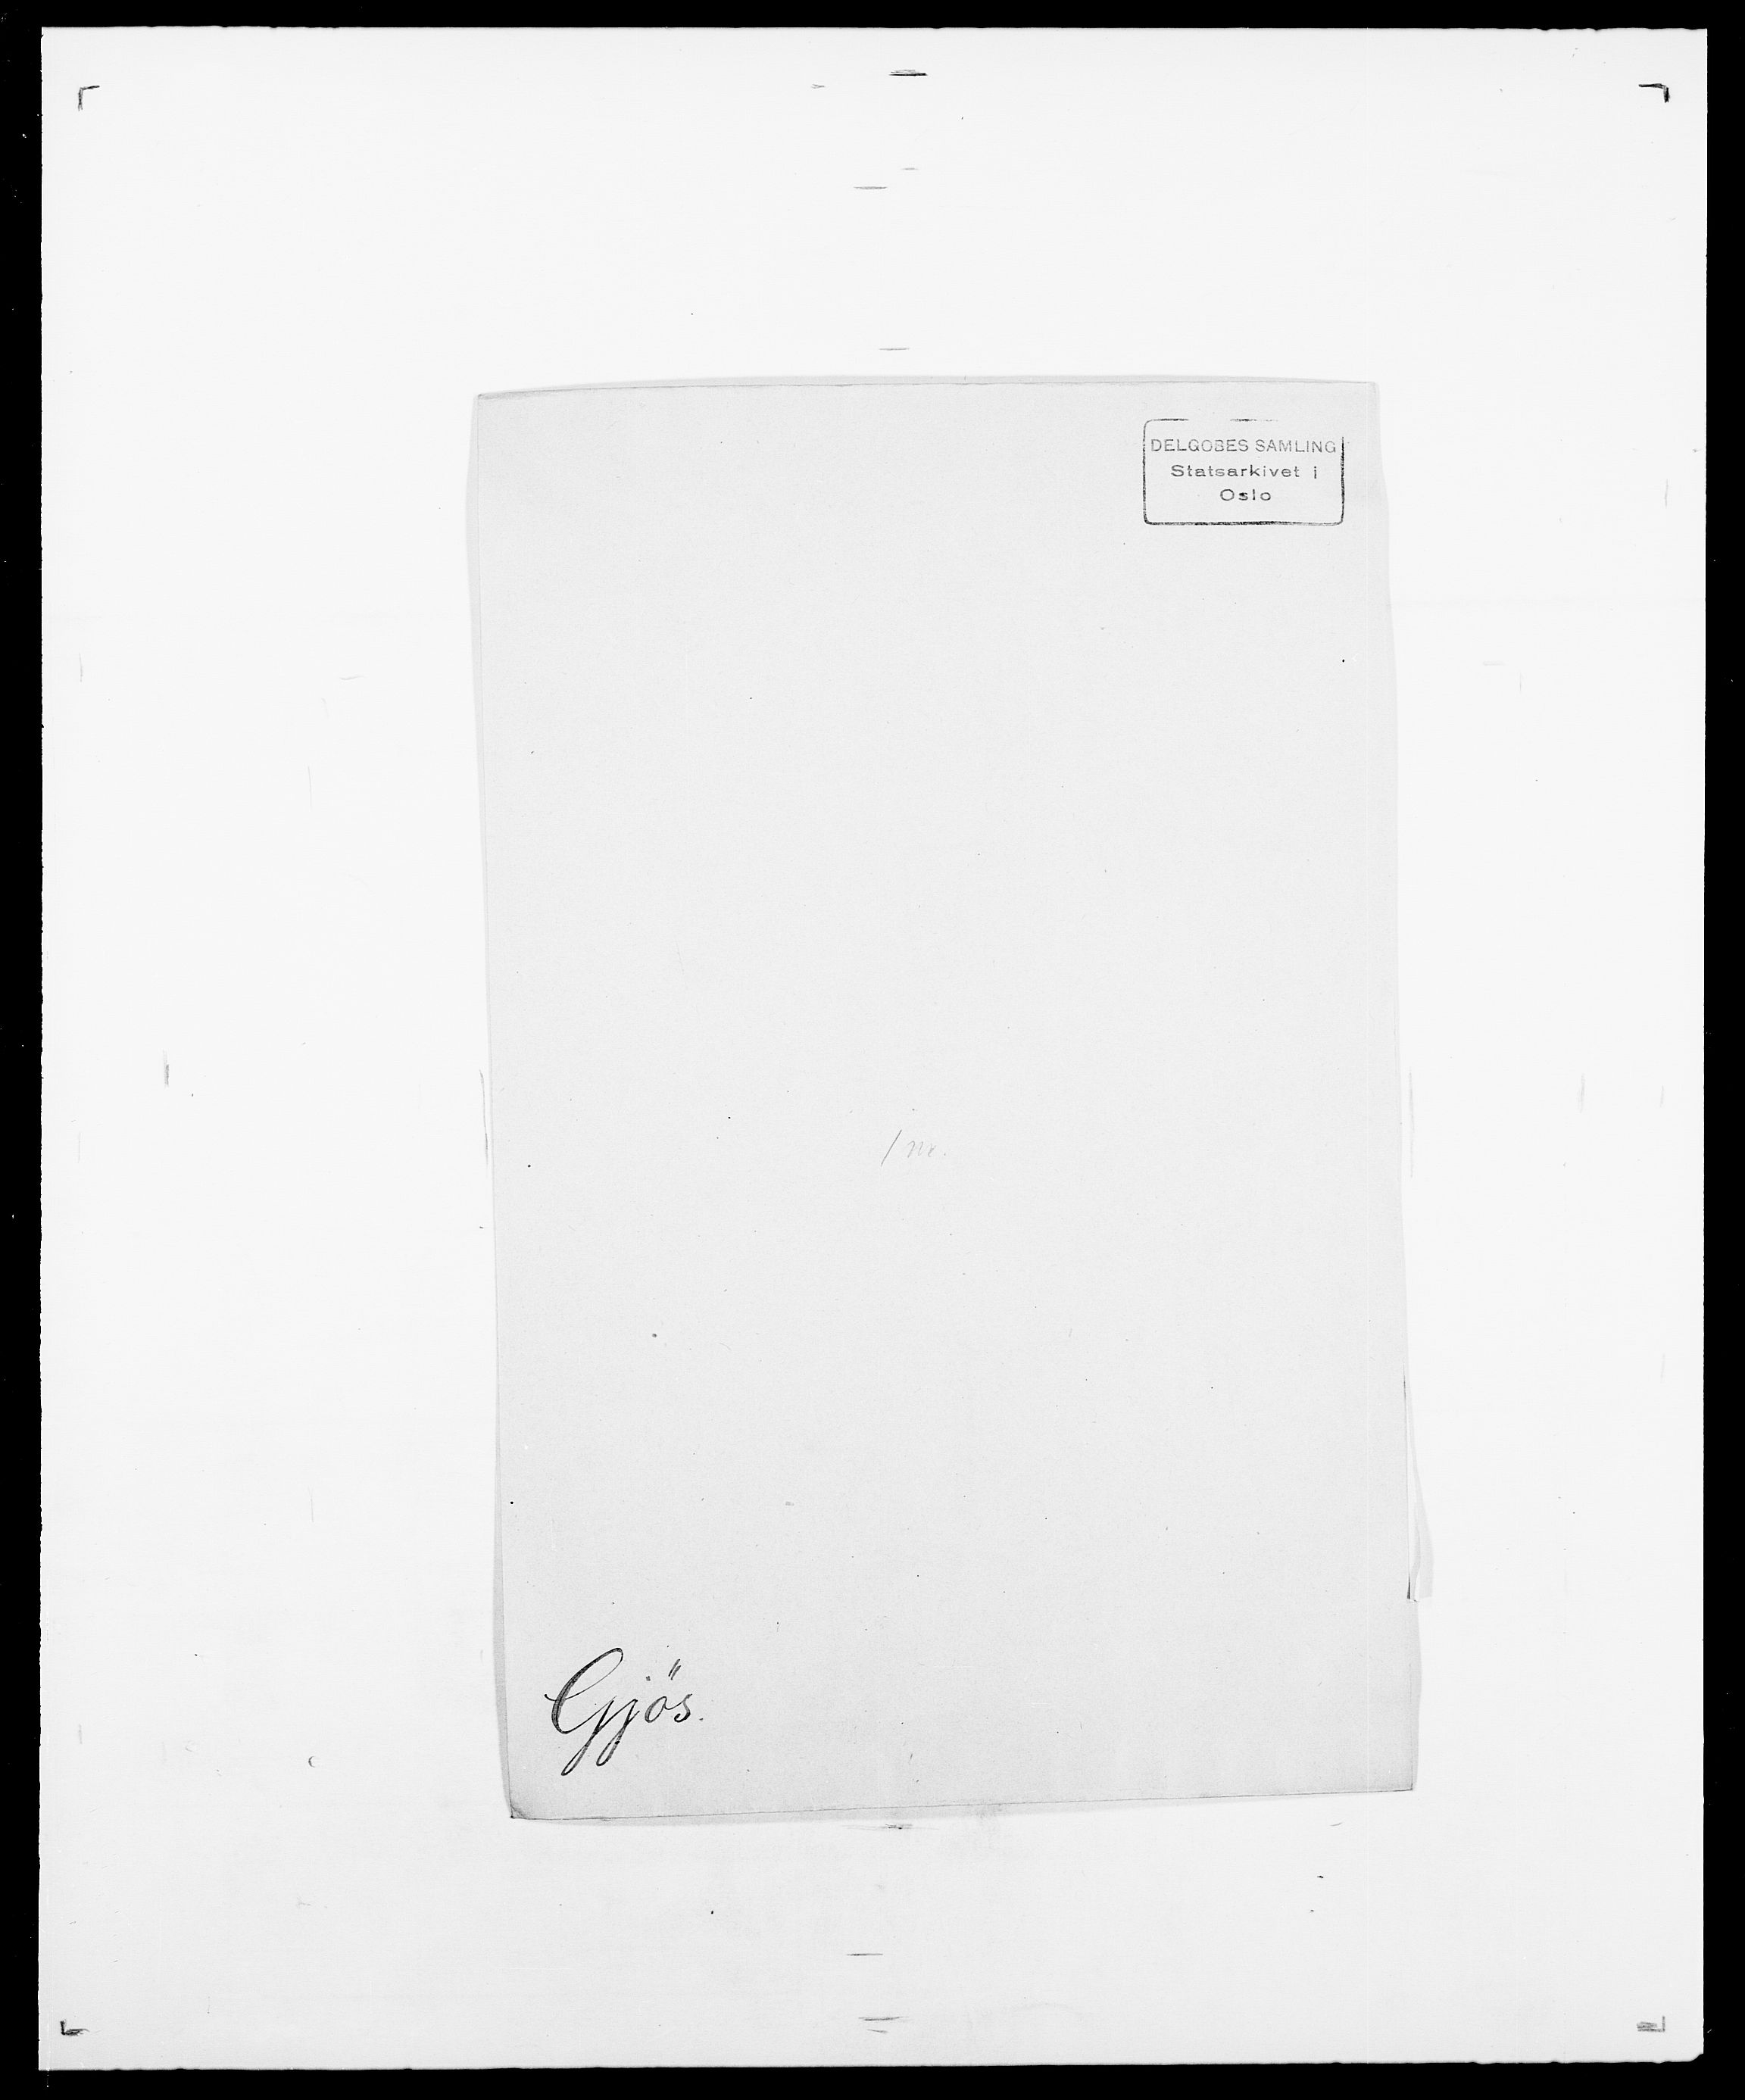 SAO, Delgobe, Charles Antoine - samling, D/Da/L0014: Giebdhausen - Grip, s. 231